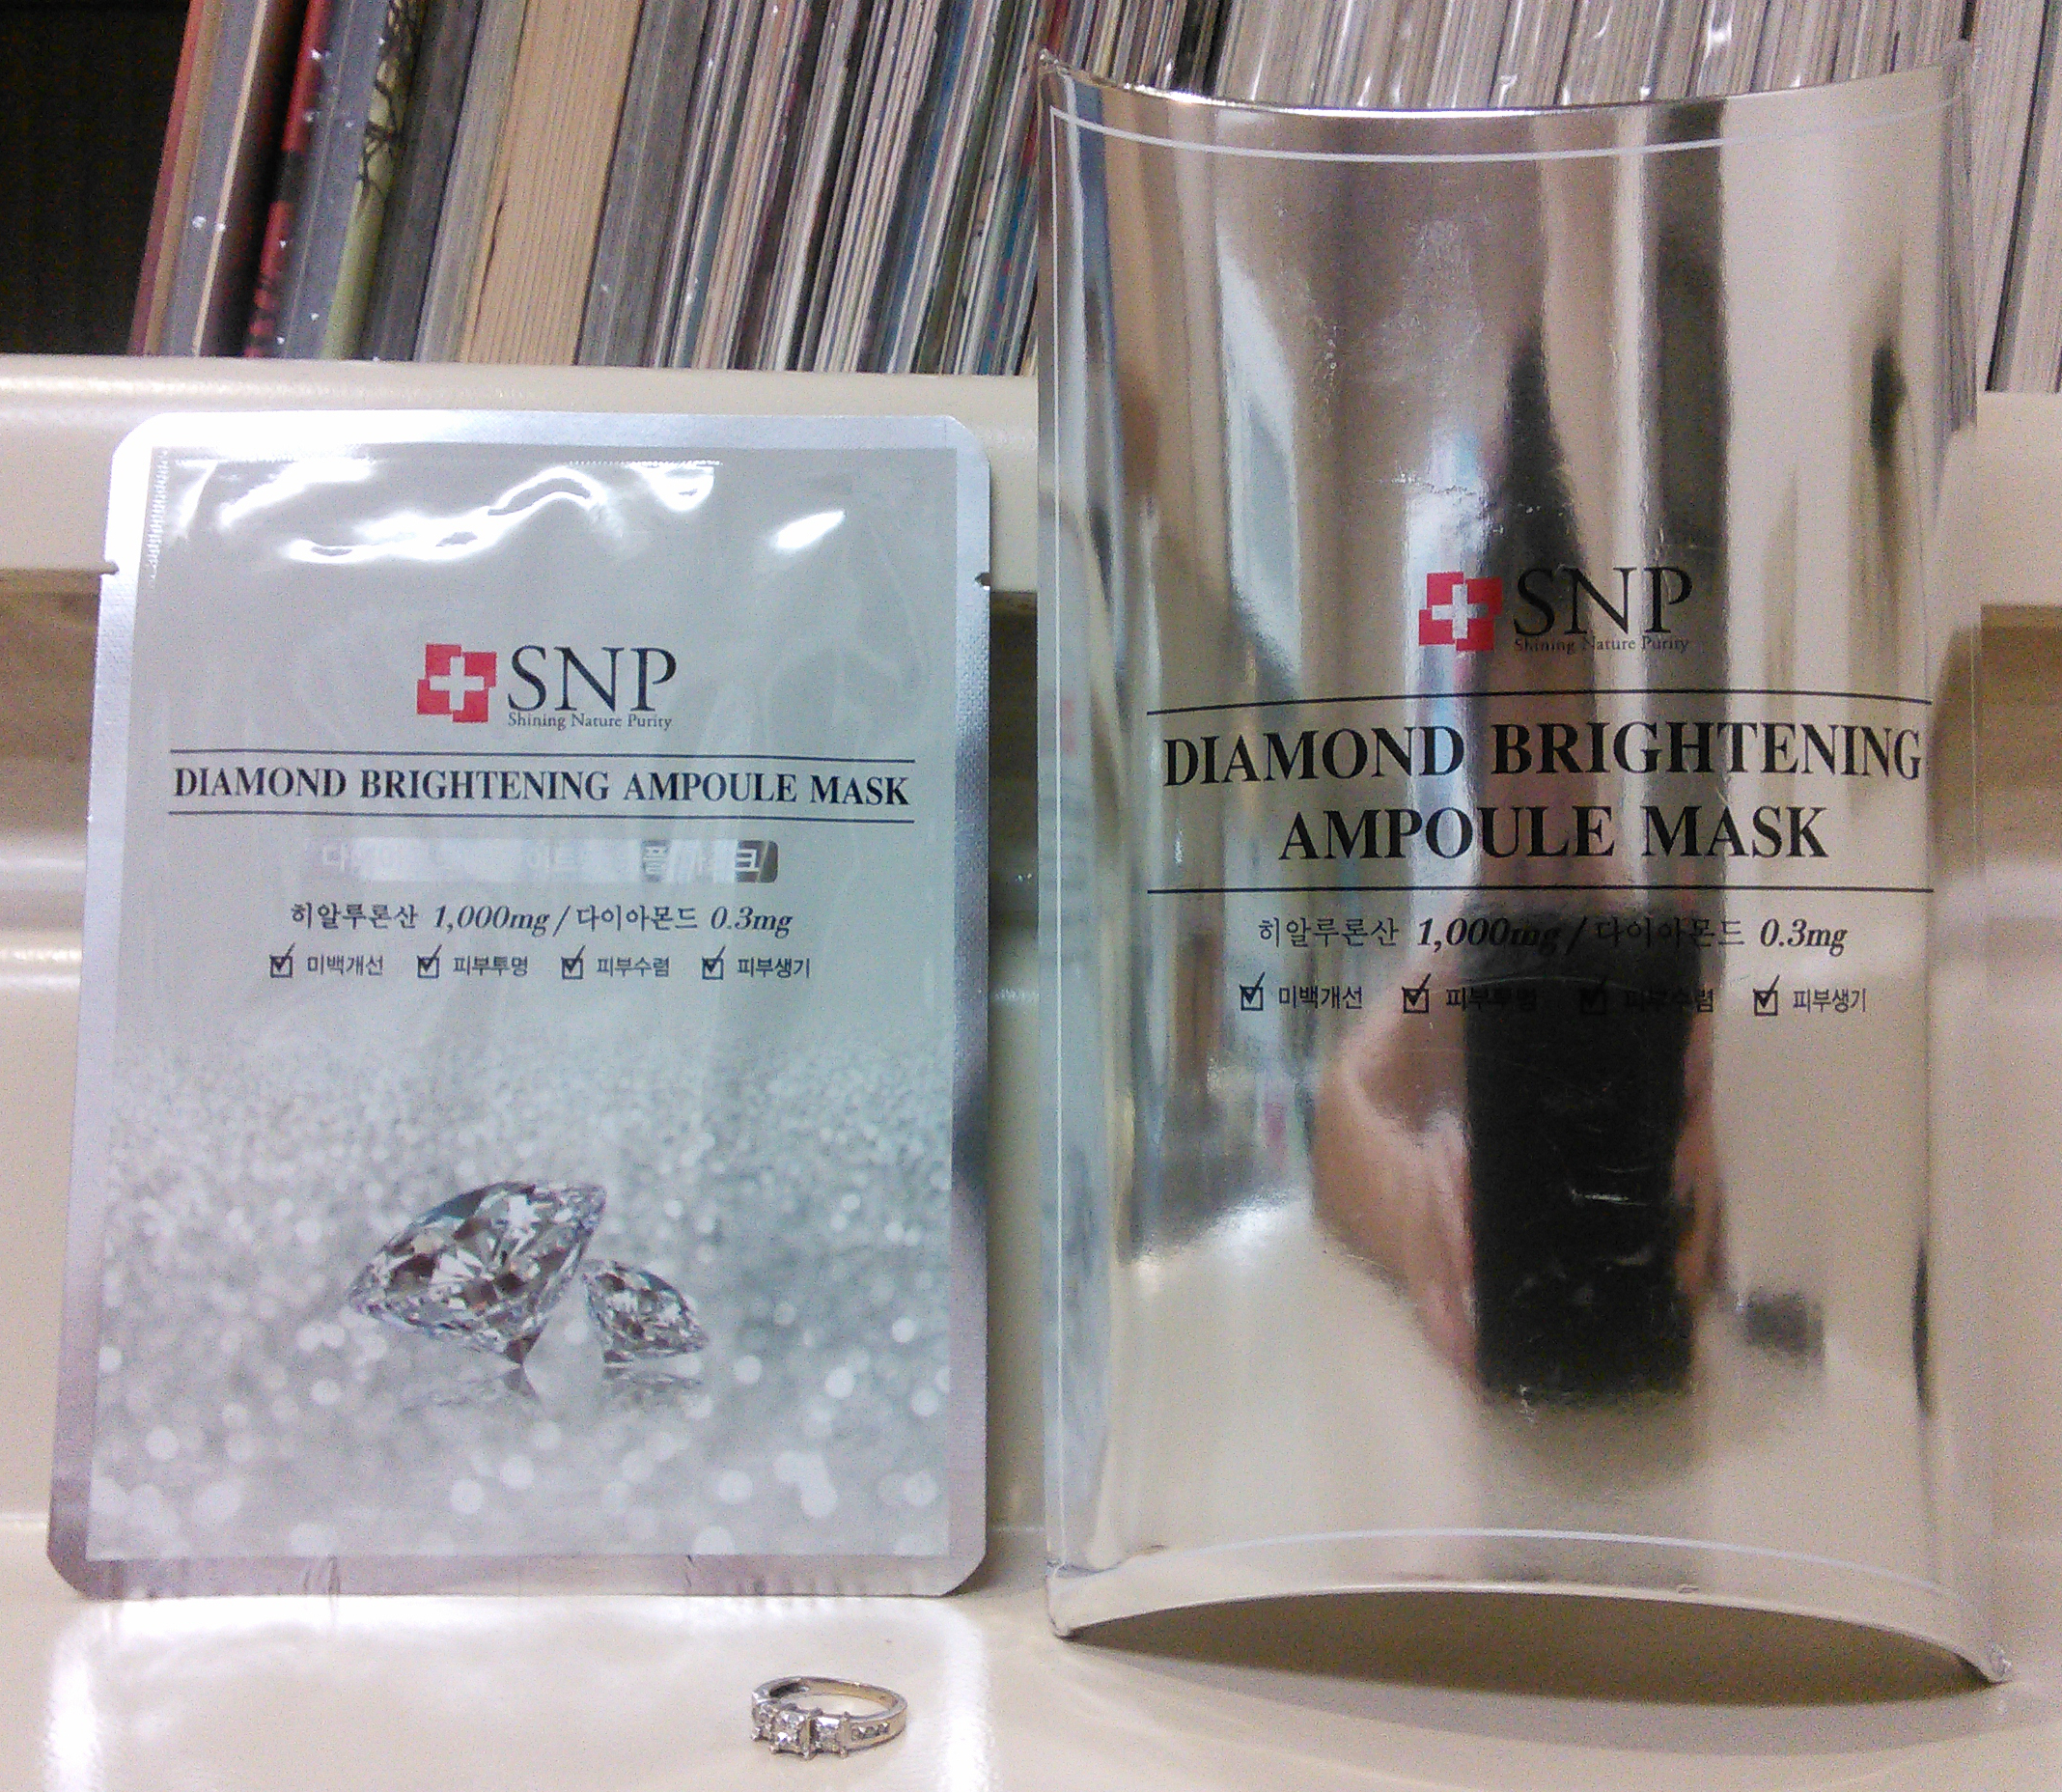 snp diamond brightening ampoule mask review